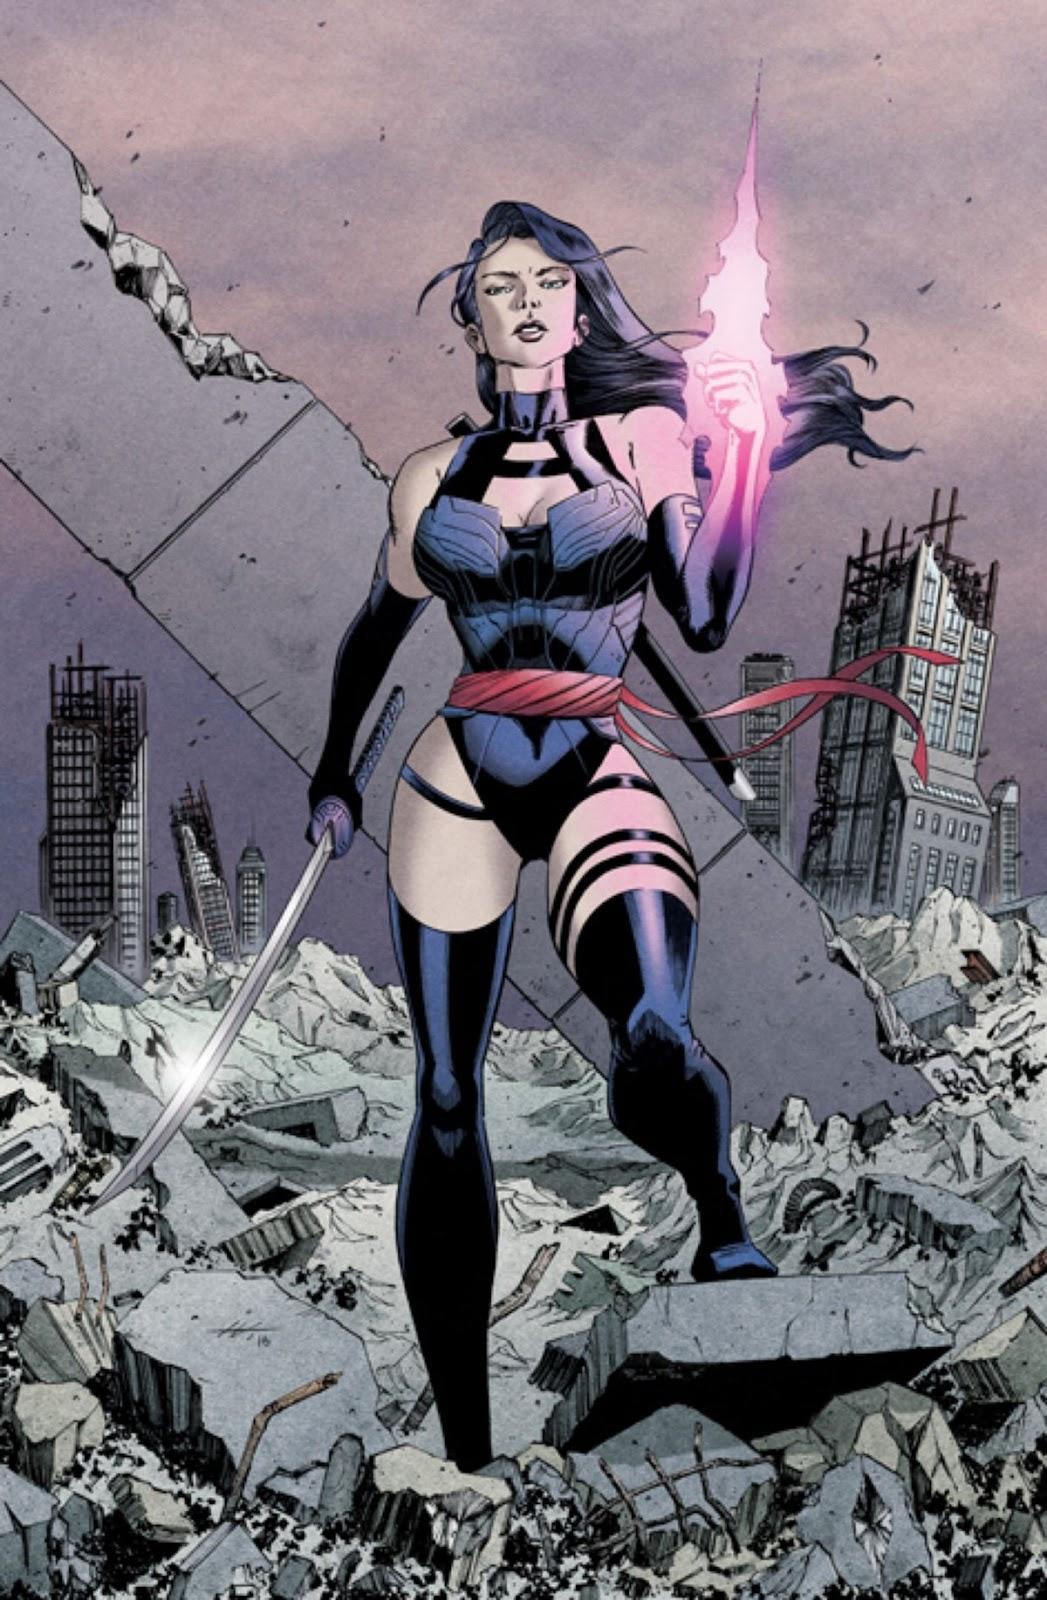 Psylocke – The sexy ninja